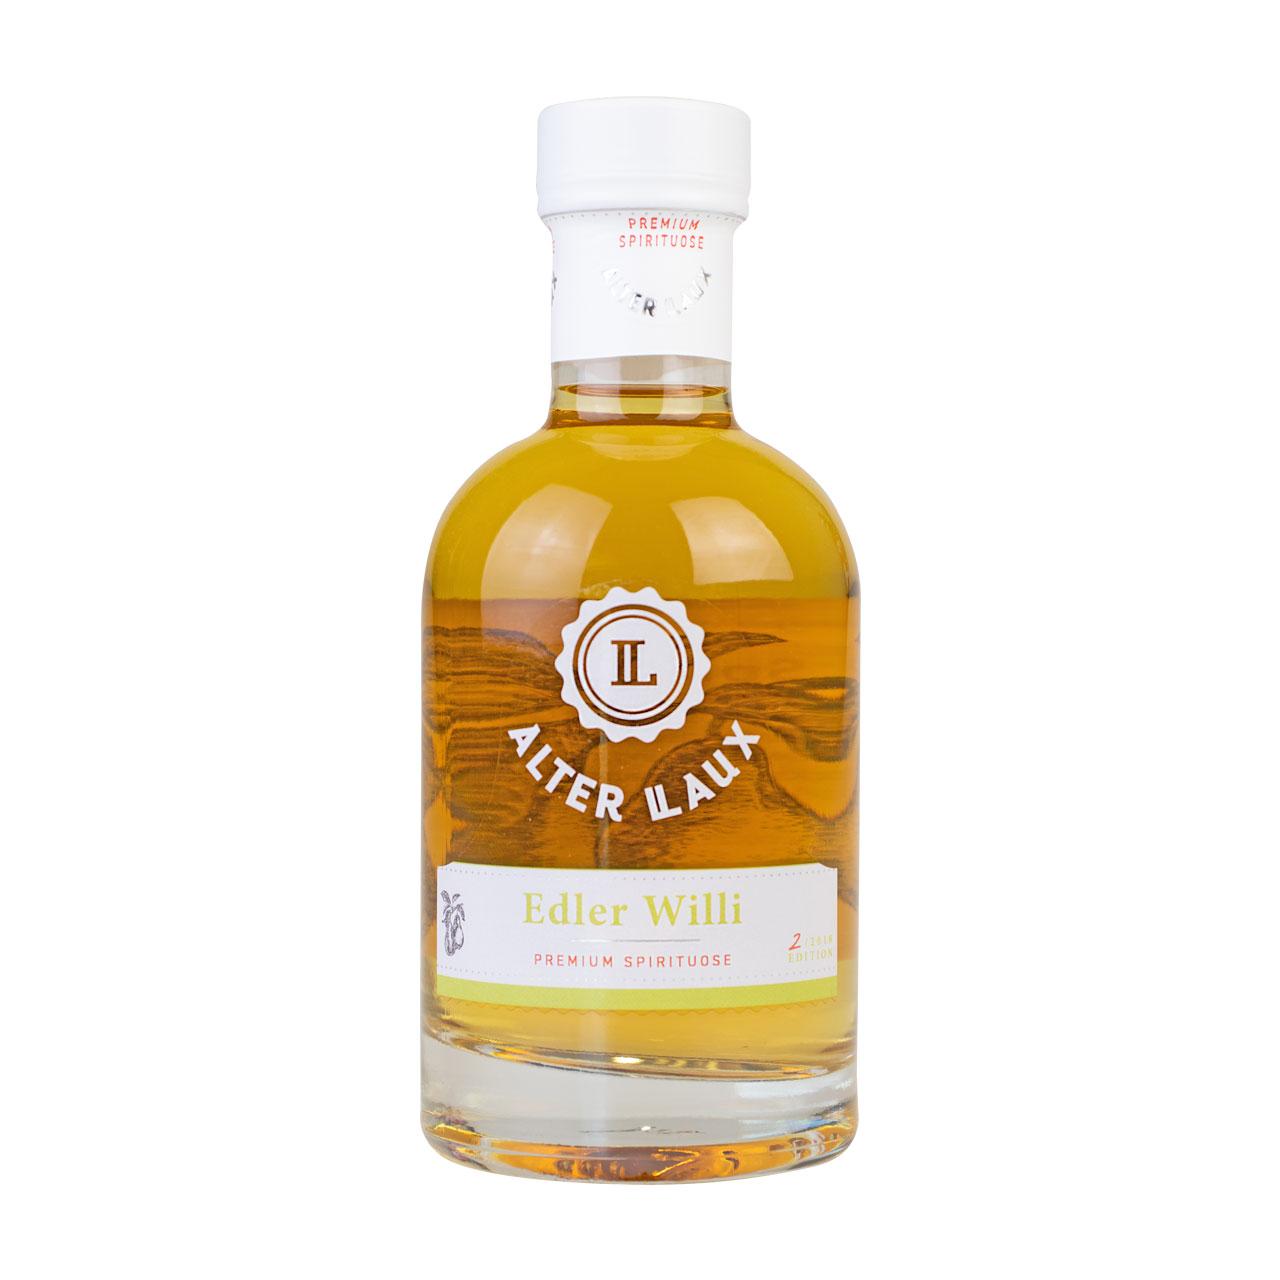 Alter Laux - Edler Willi 200 ml